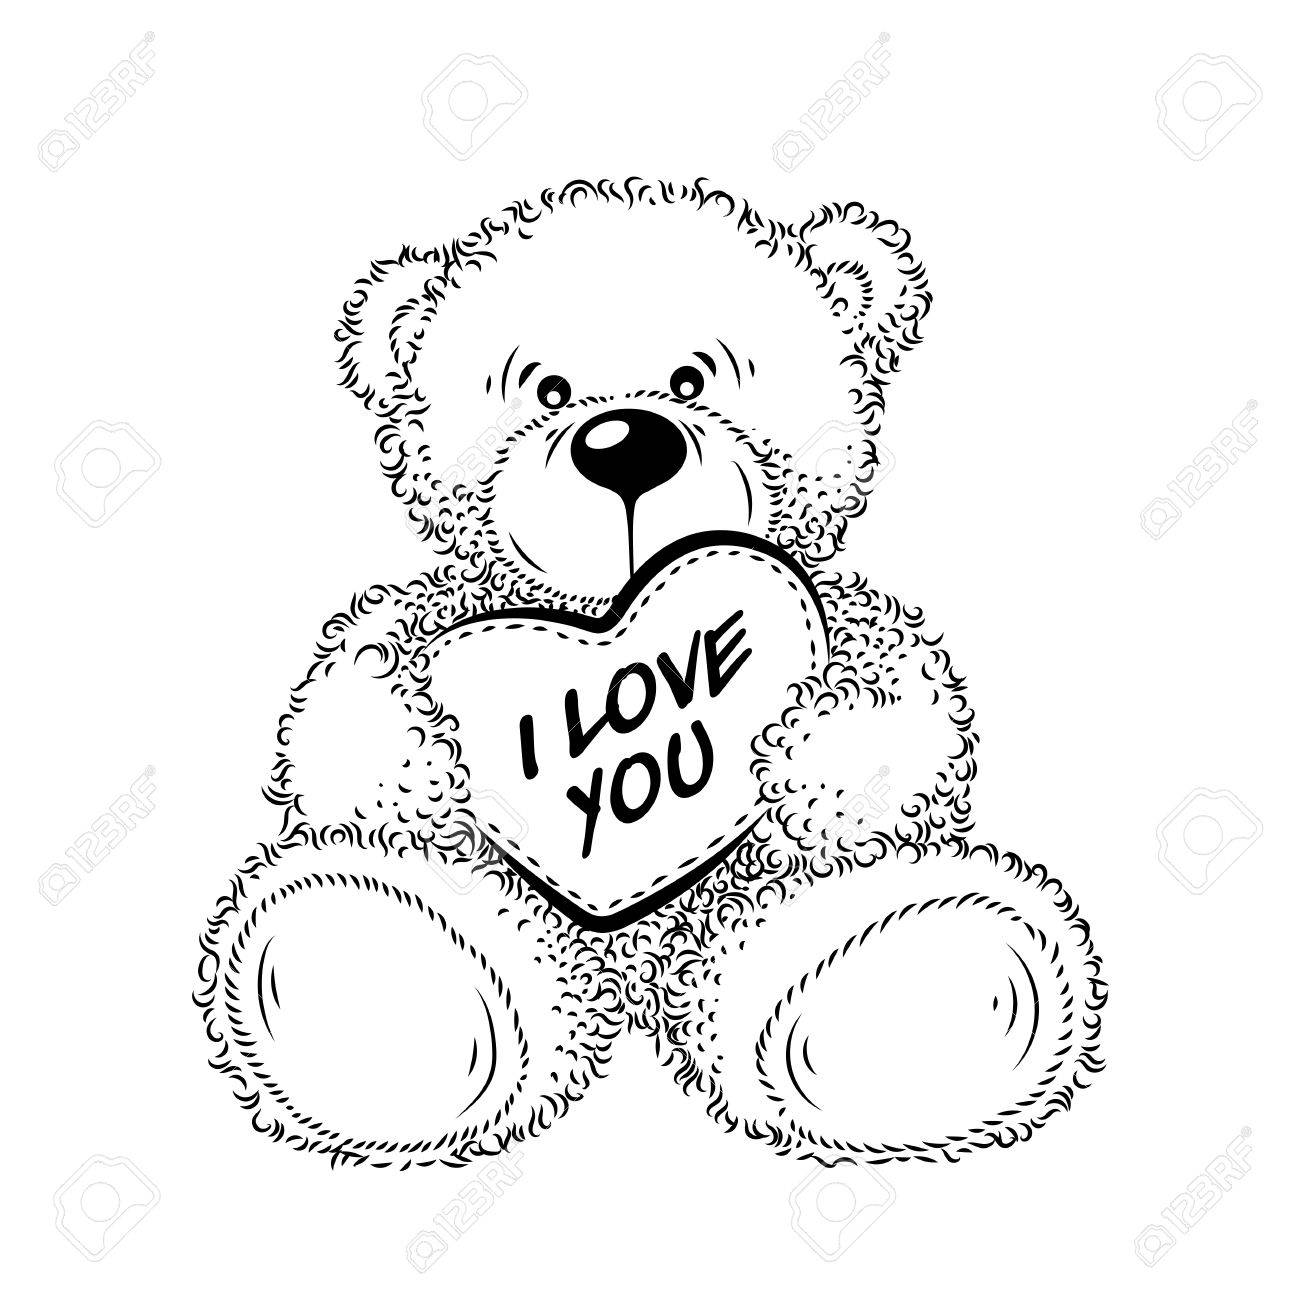 1300x1300 Cute Drawing Teddy Bear With Heart. Vector Illustration Royalty